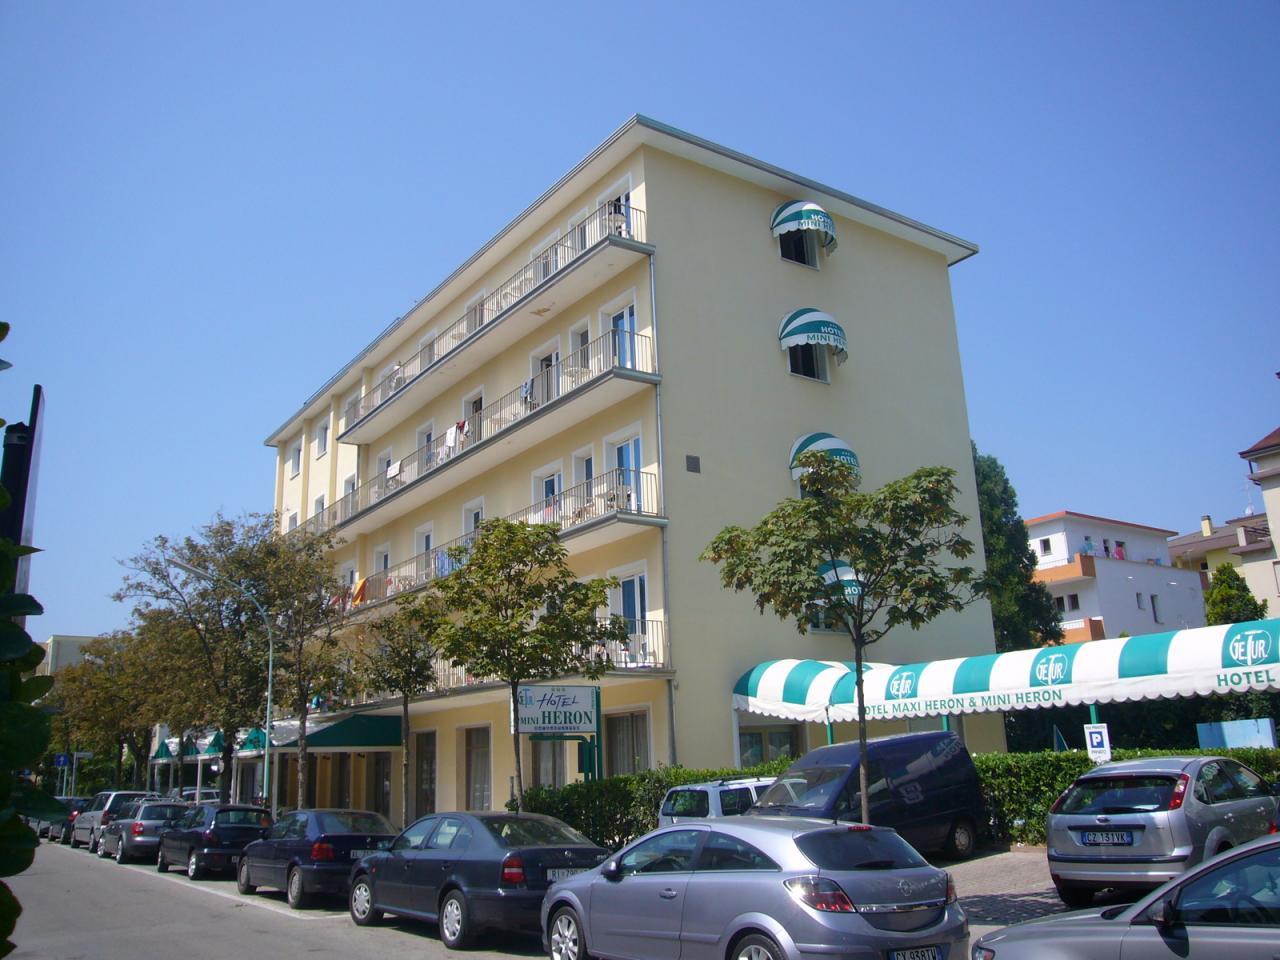 Hotel Miniheron